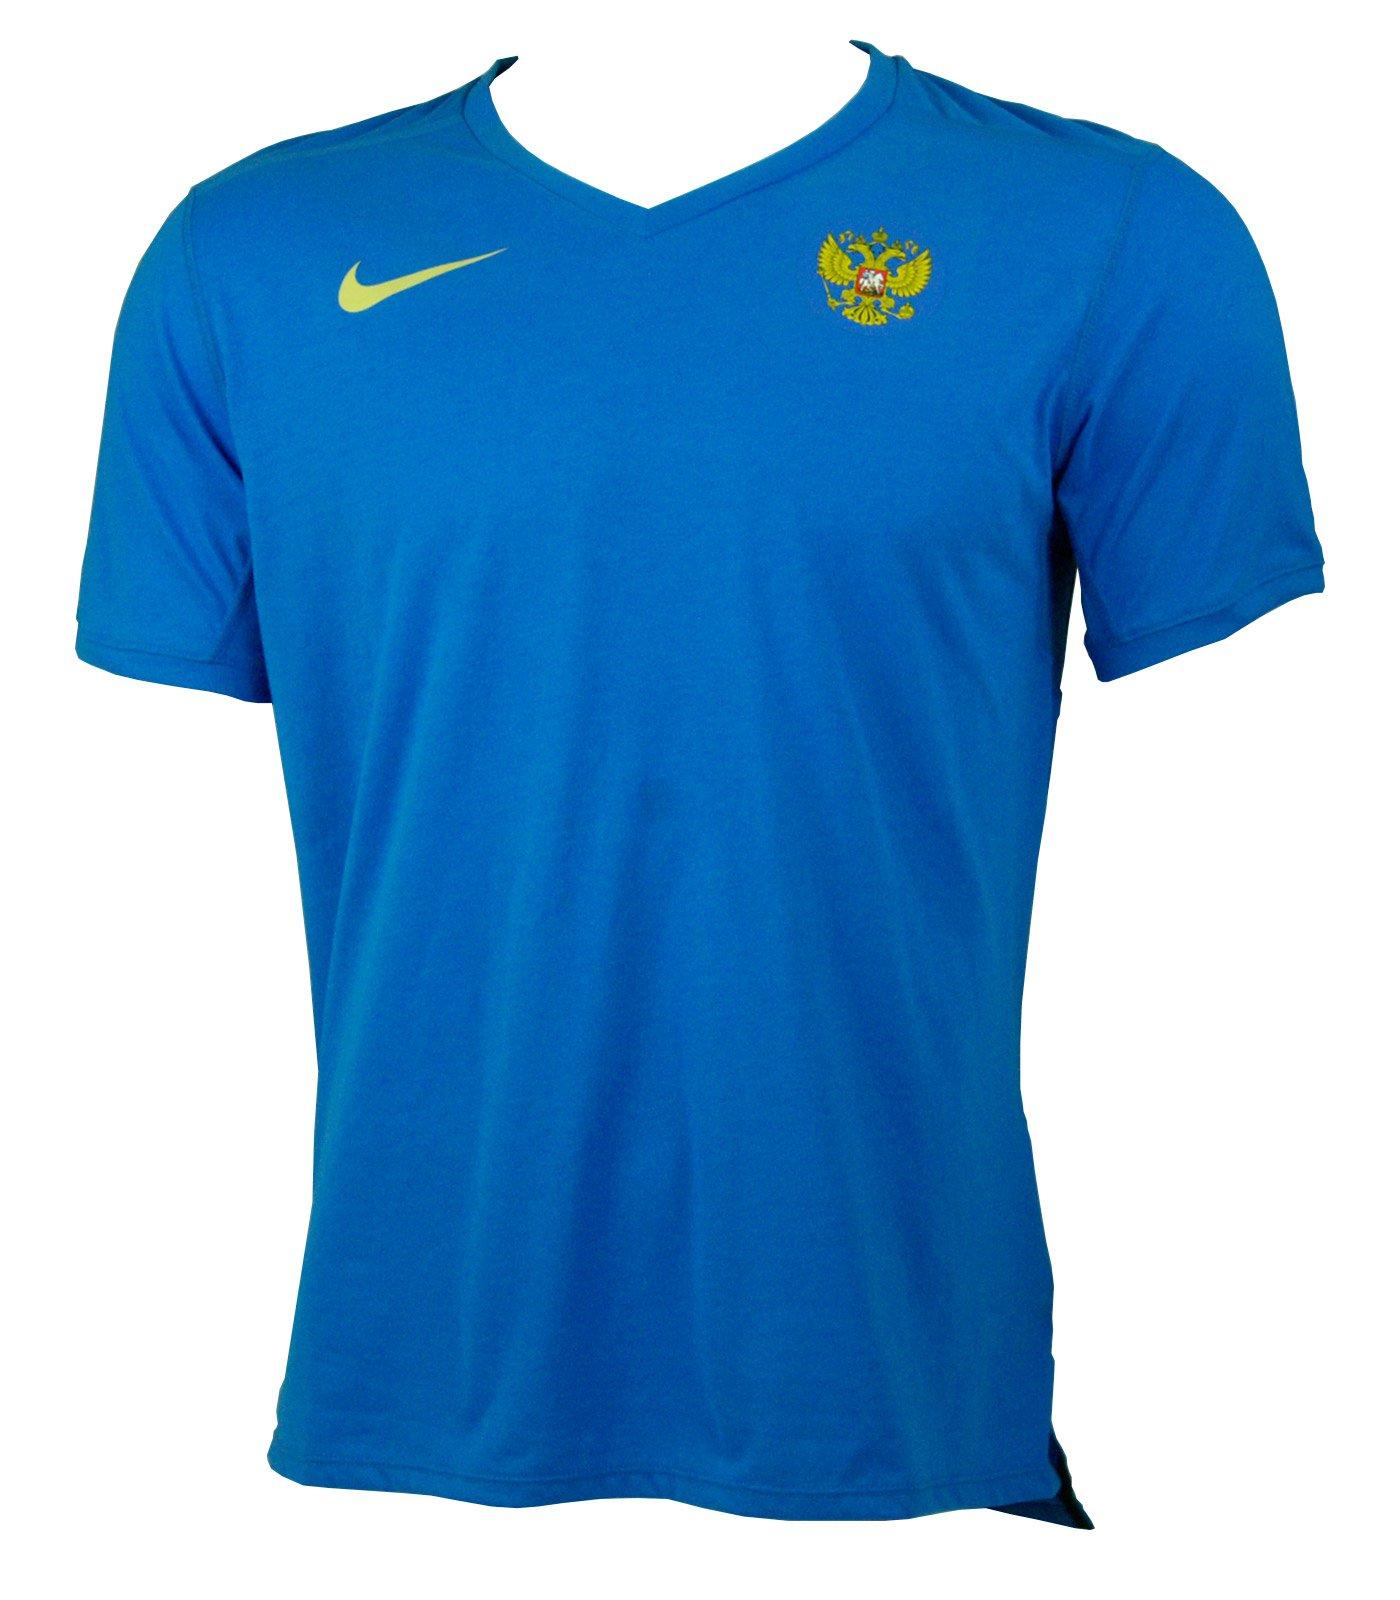 Купить футболку Nike Russia Tailwind V-Neck Tee   Интернет-магазин ... e49fc35c159